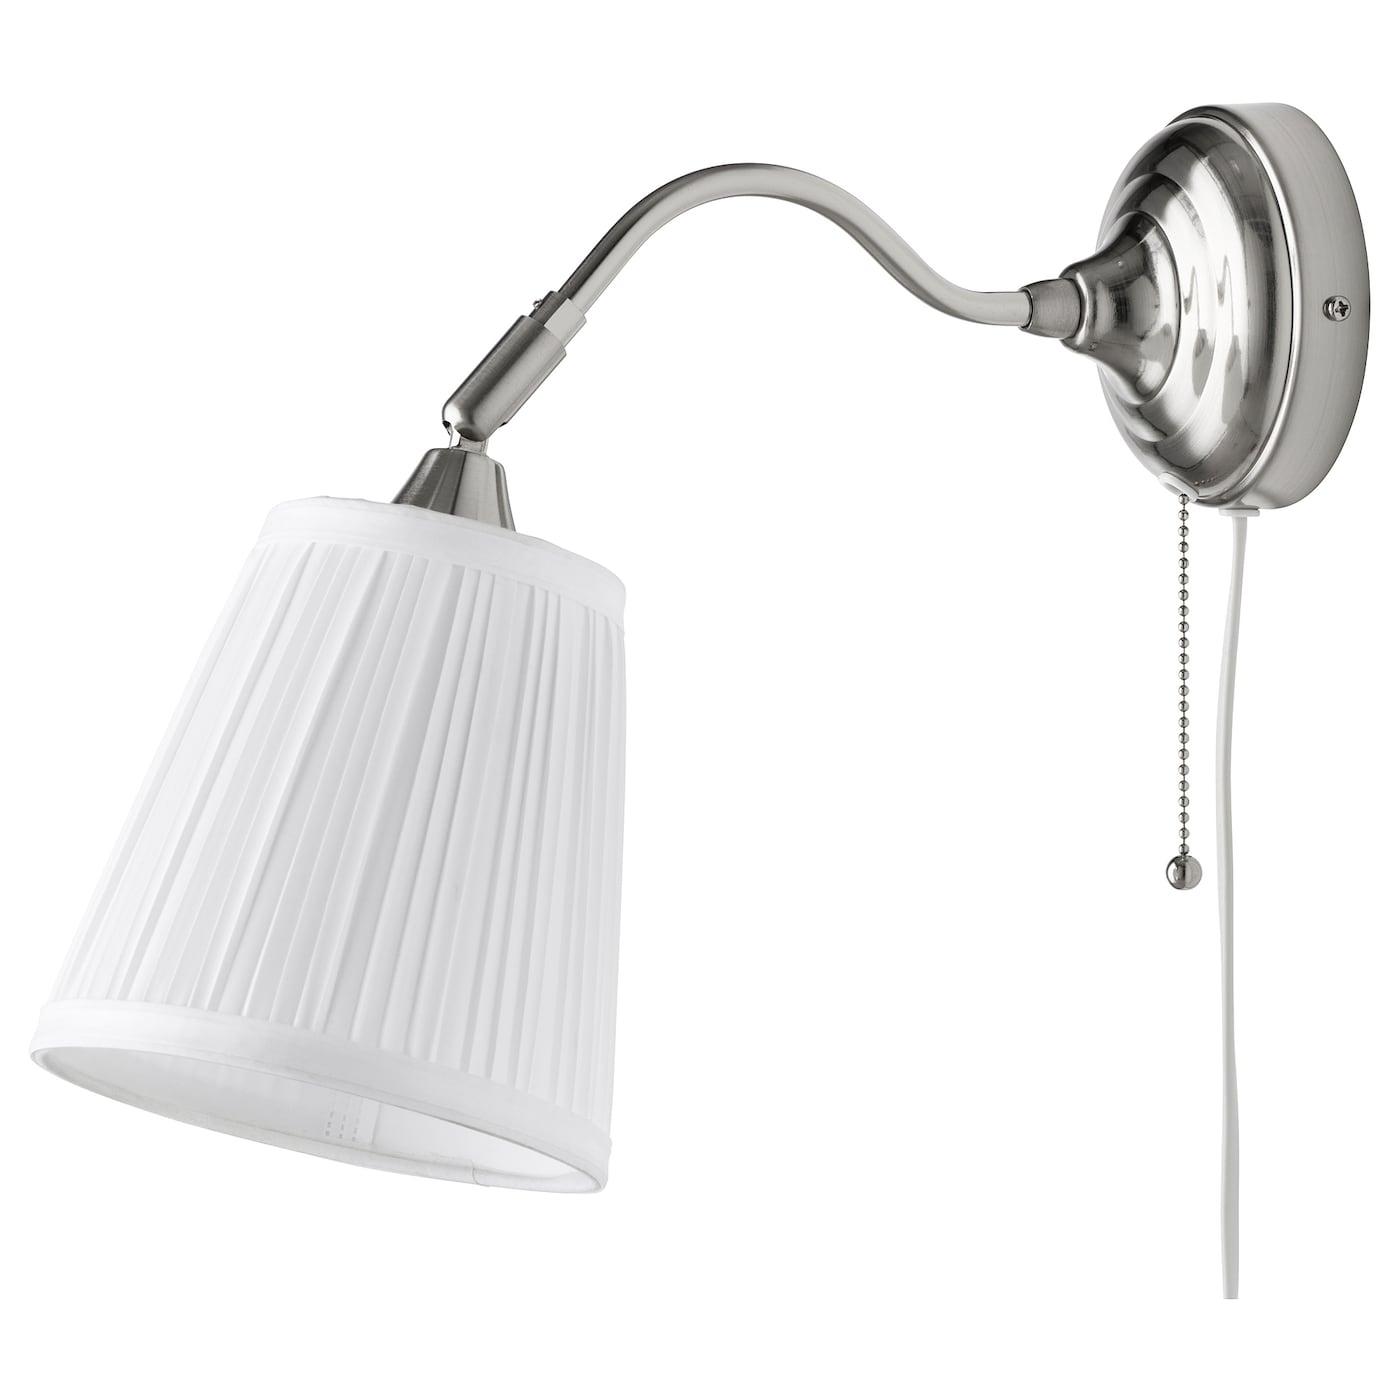 Bedroom Lighting Bedside Lamps Ikea Light Fixture Wiring 2 White Black Rstid Wall Lamp